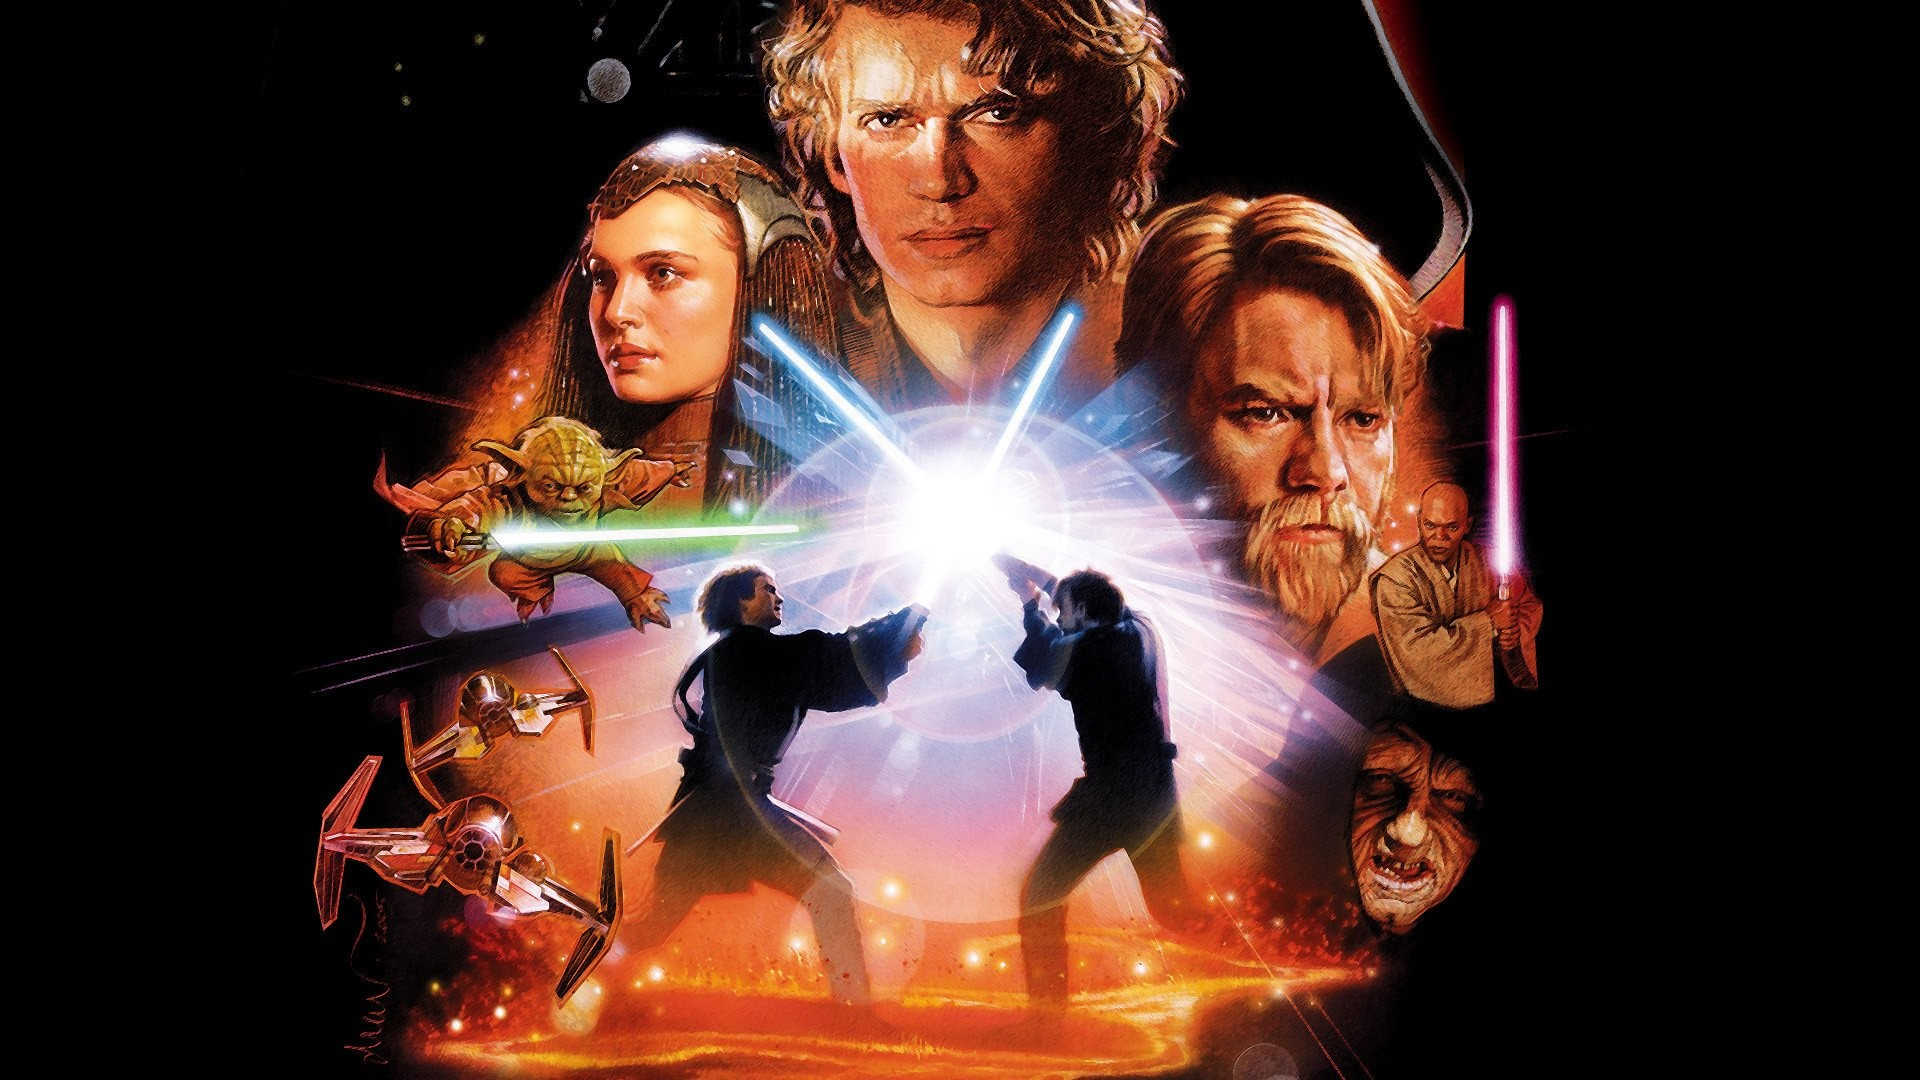 Res: 1920x1080, Filme - Star Wars Episode III: Revenge of the Sith Wallpaper